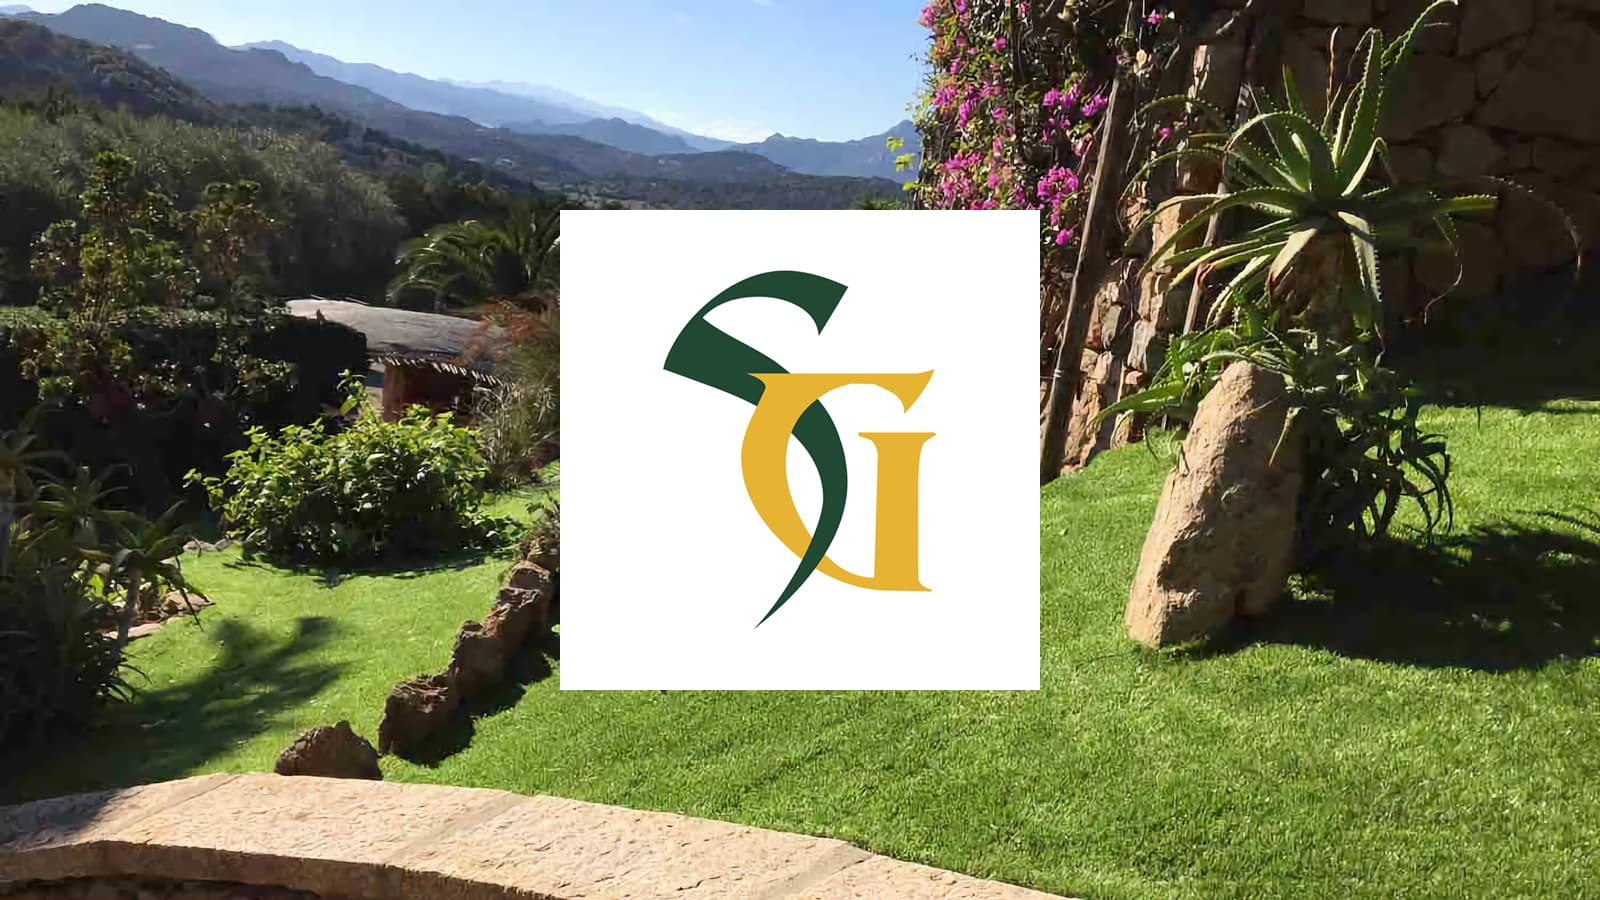 un giardino con prato in erba sintetica, varie piante e logo SG